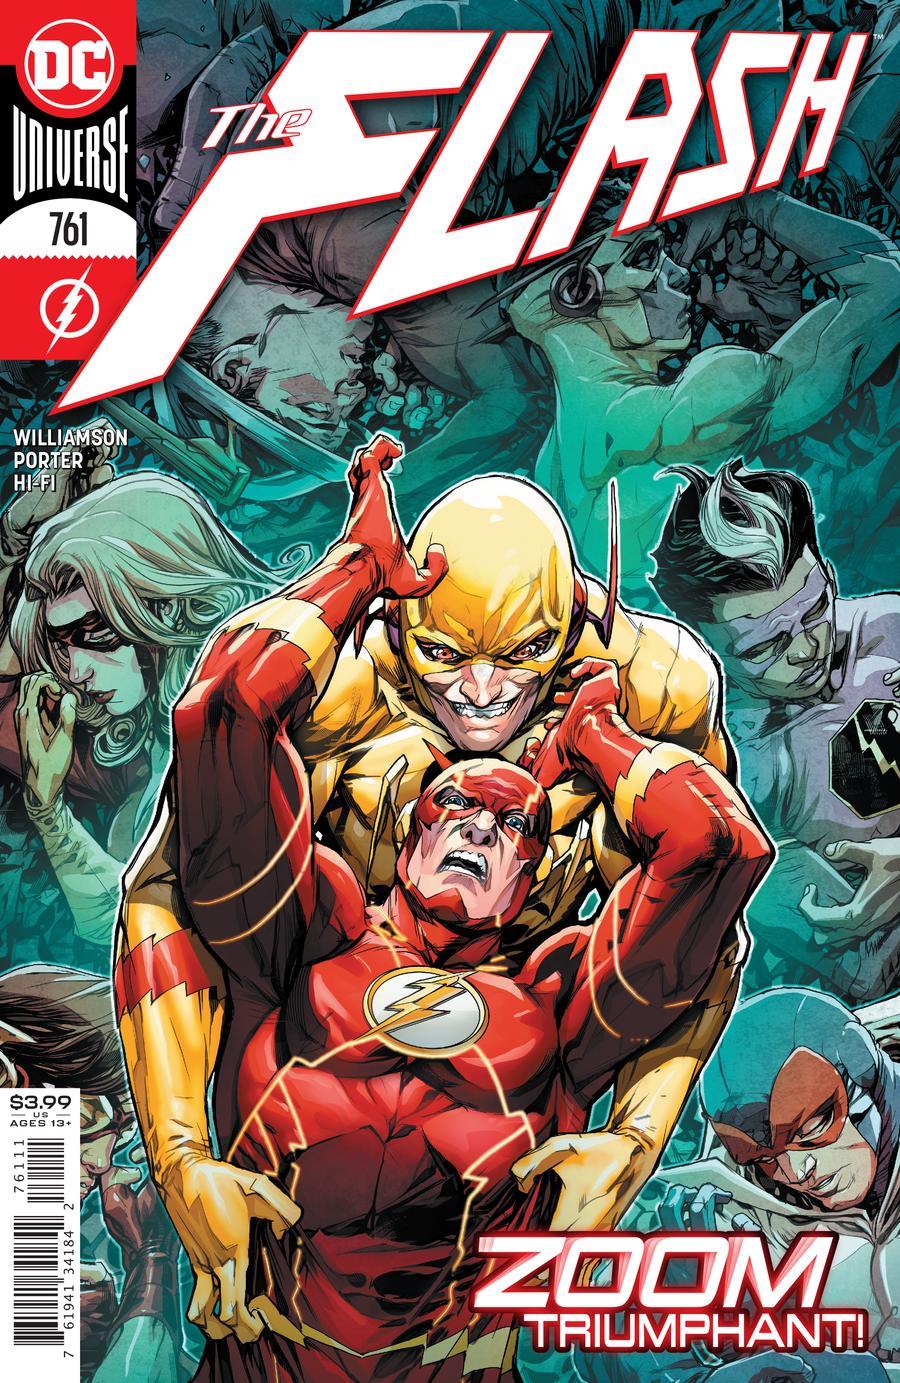 Flash Vol 1 #761 Cover A Howard Porter